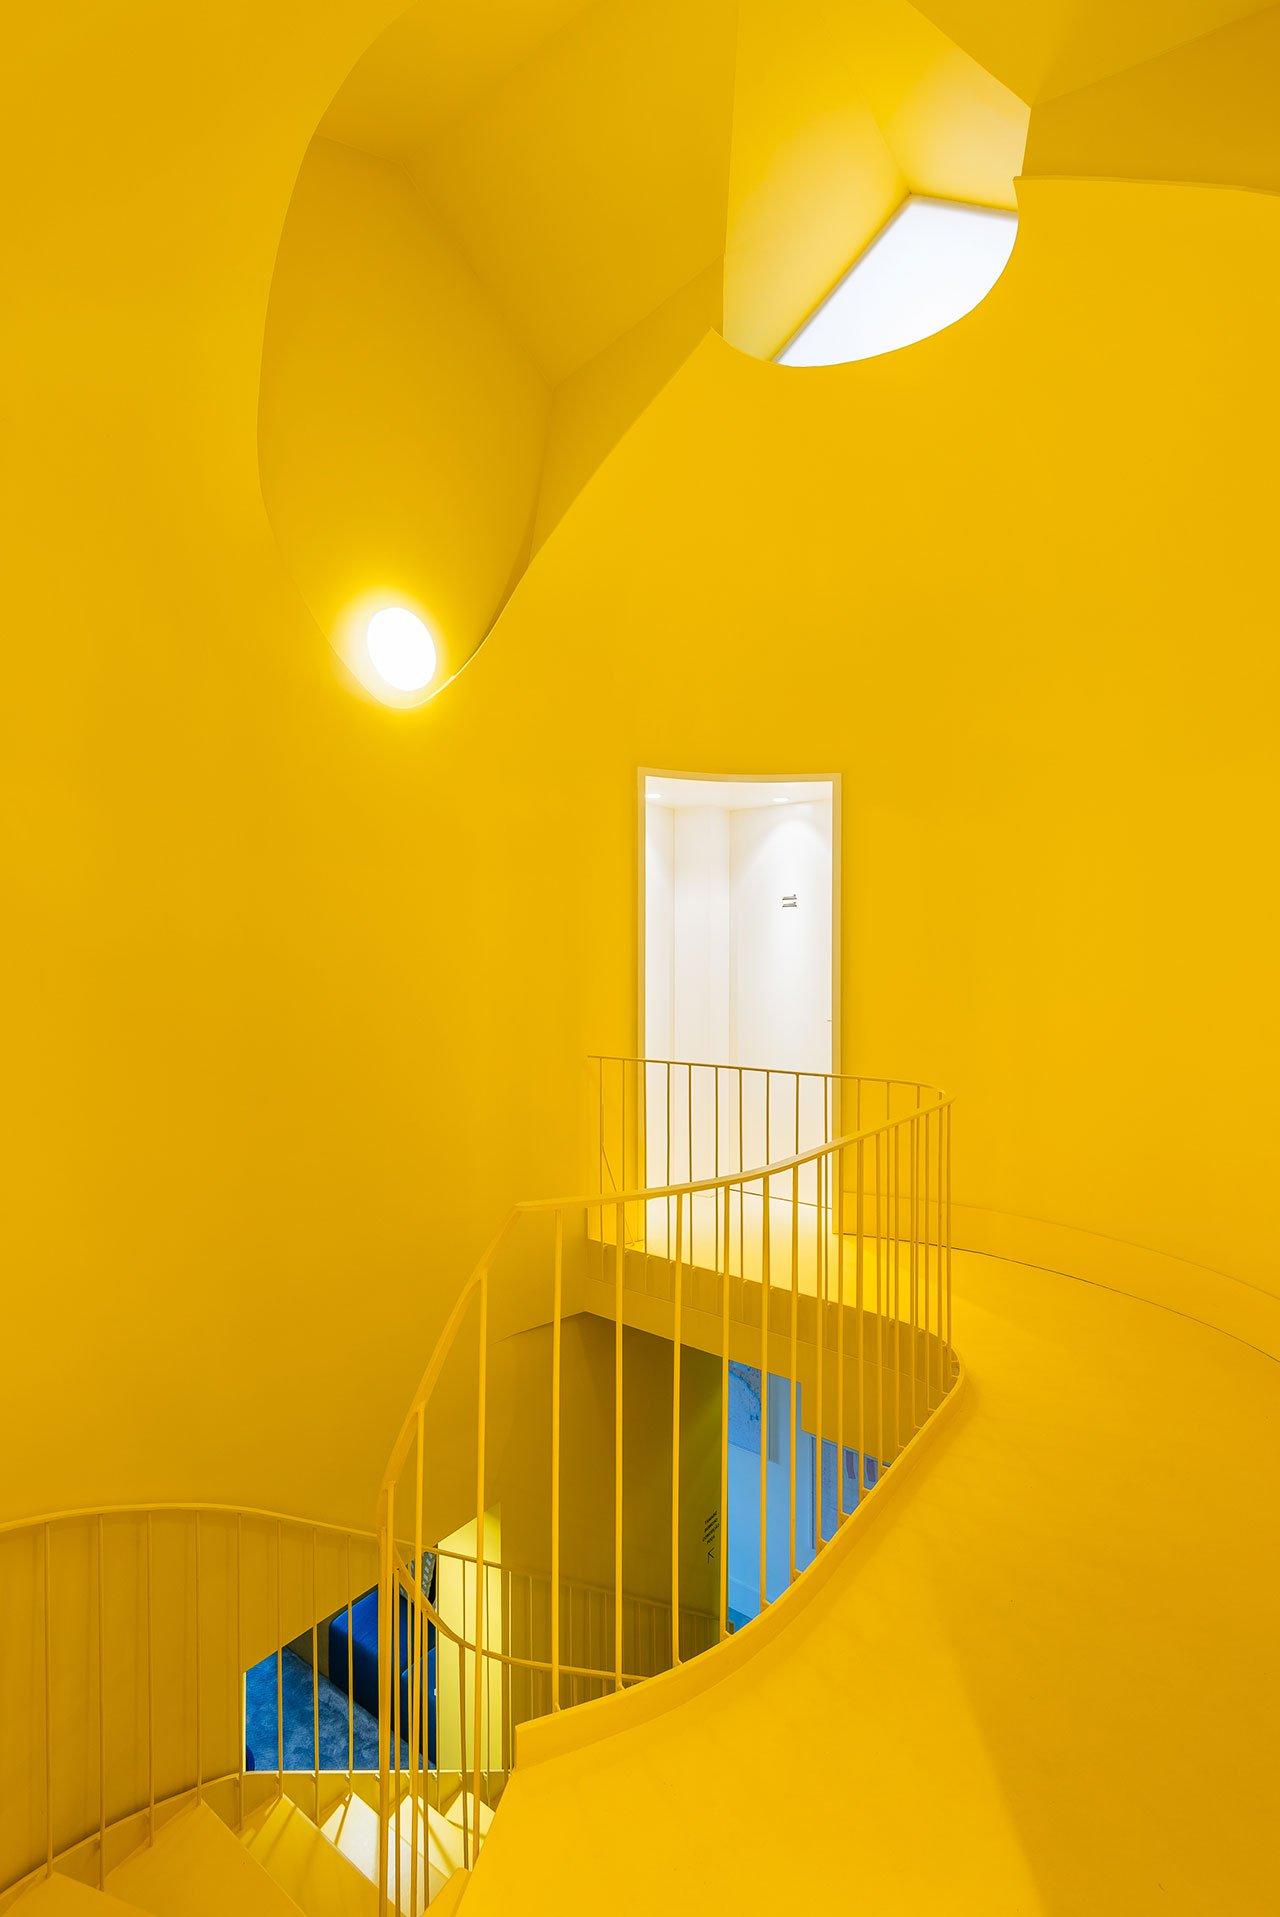 f3_hostel_in_parede_cascais_portugal_aurora_arquitectos_photo_do_mal_o_menos_yatzer.jpg